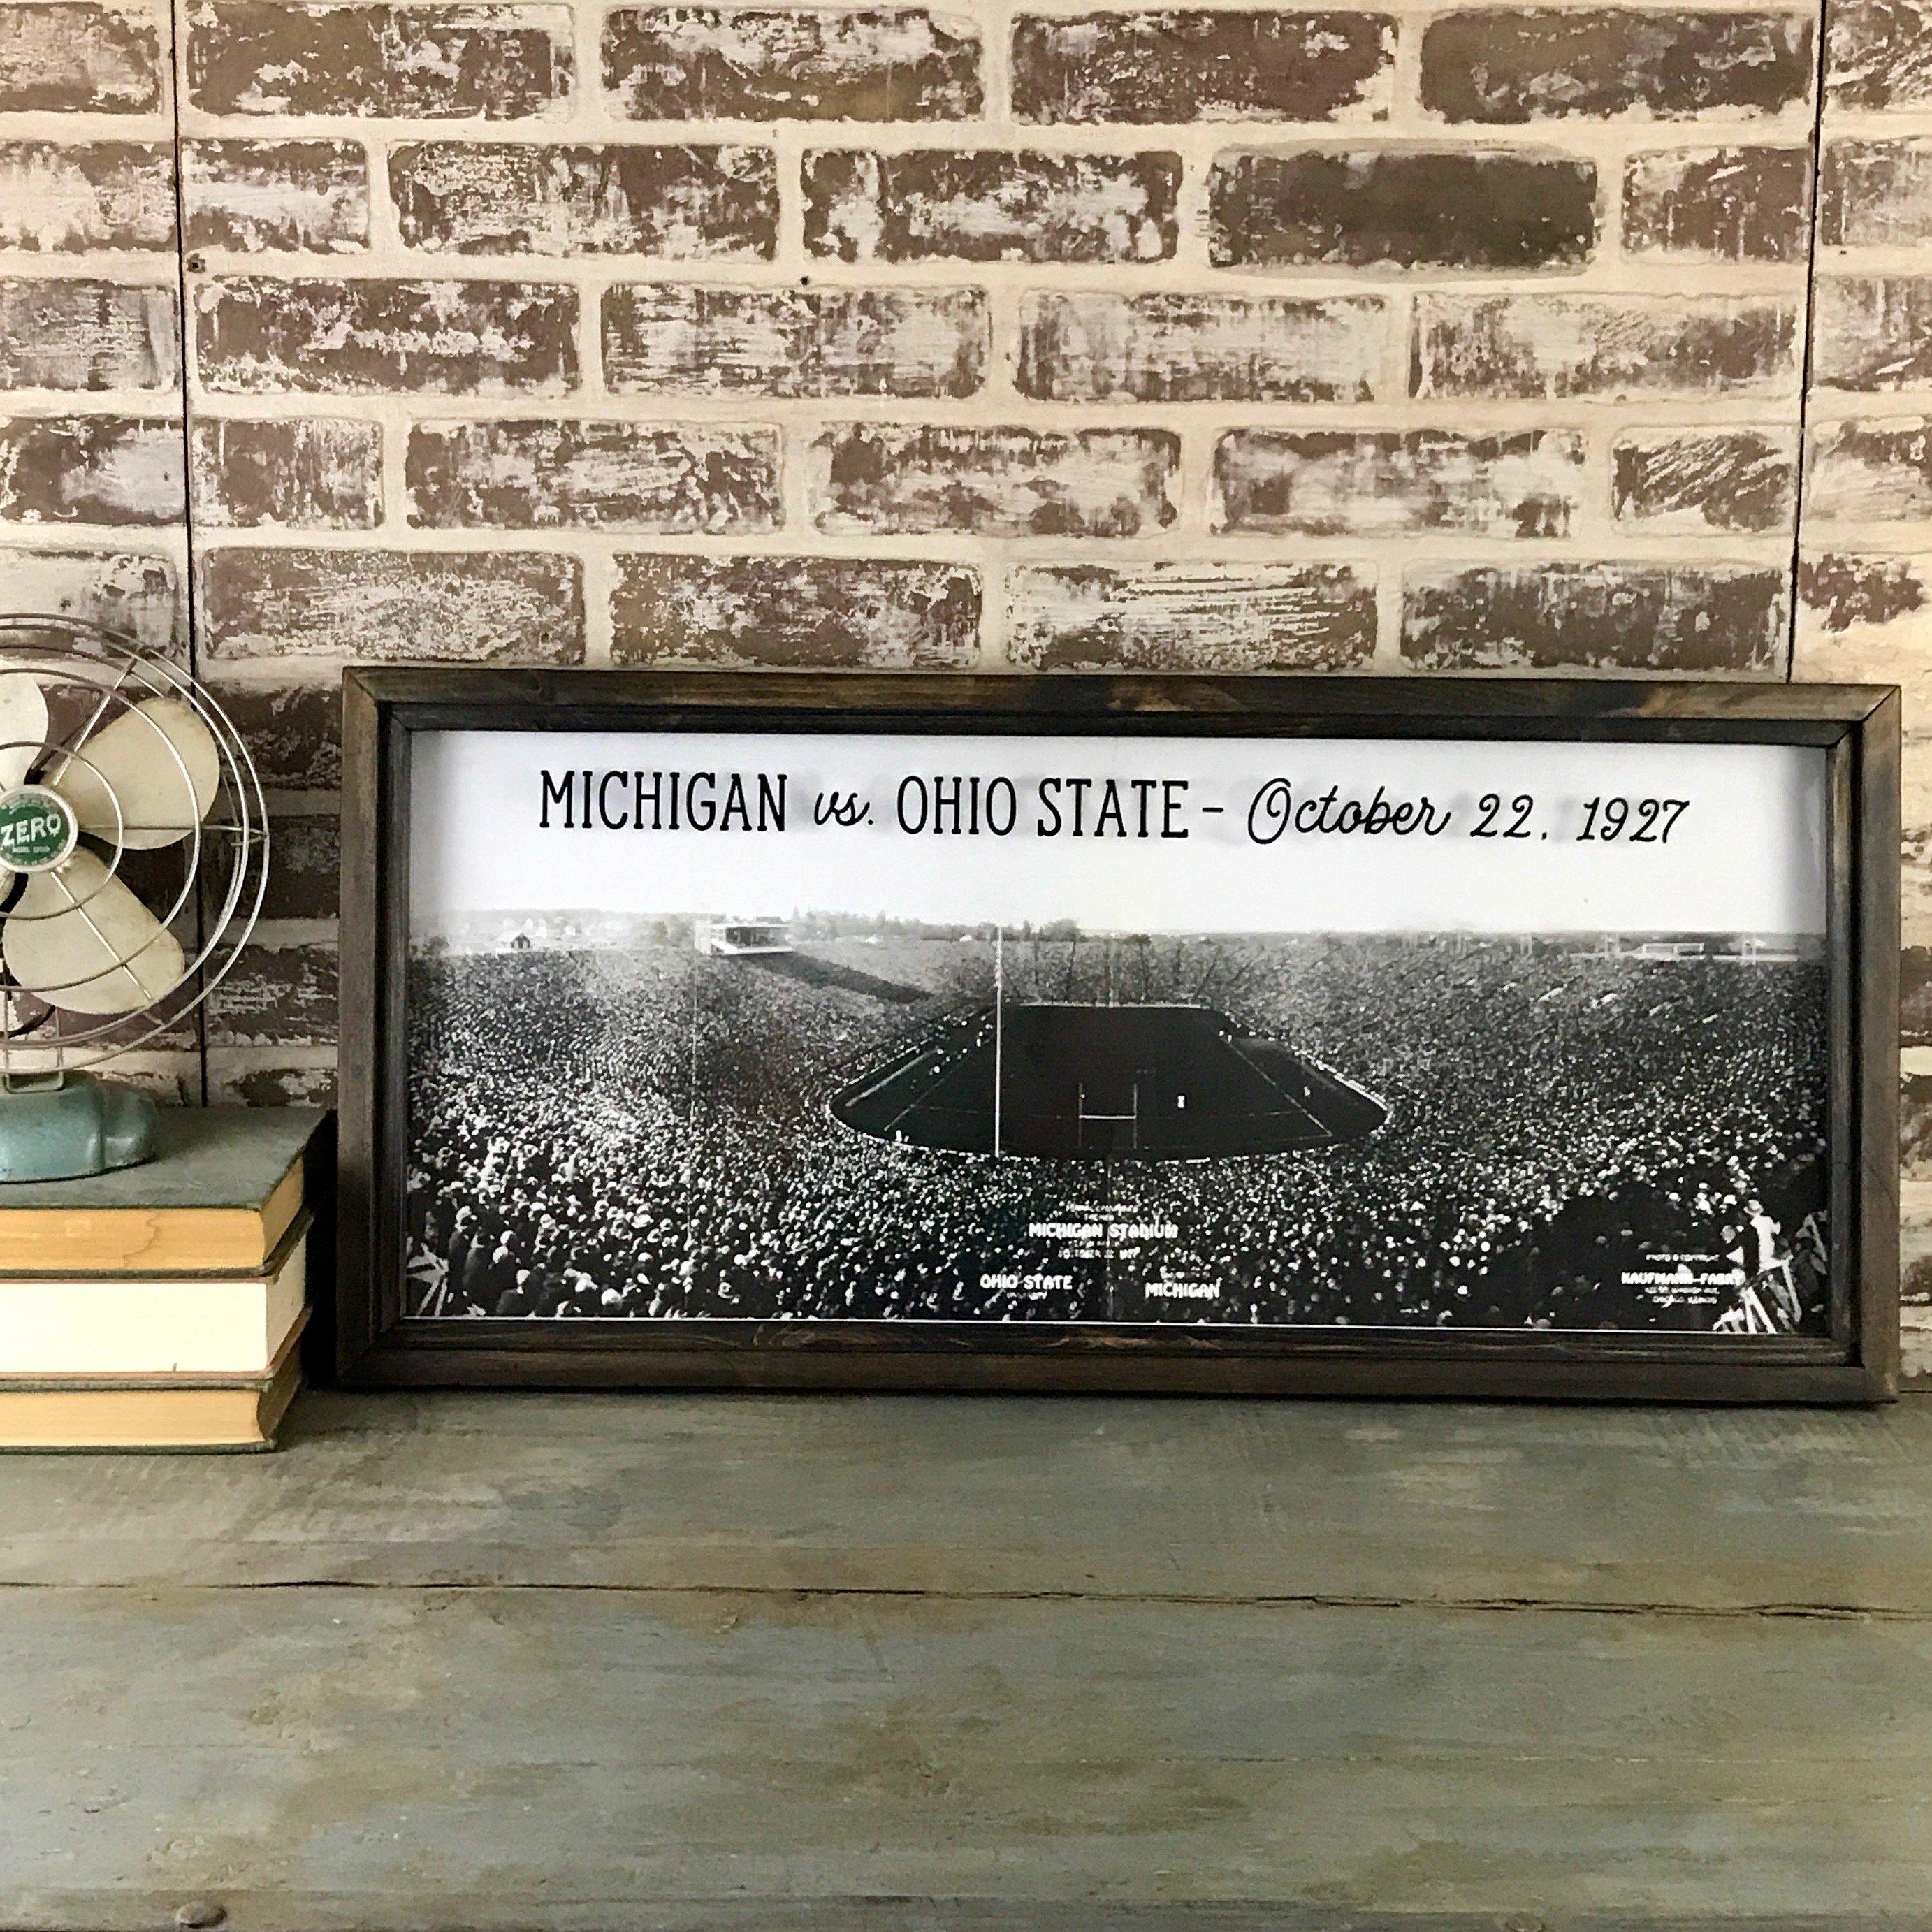 Vintage Michigan Football Game Photo At Teh Big House